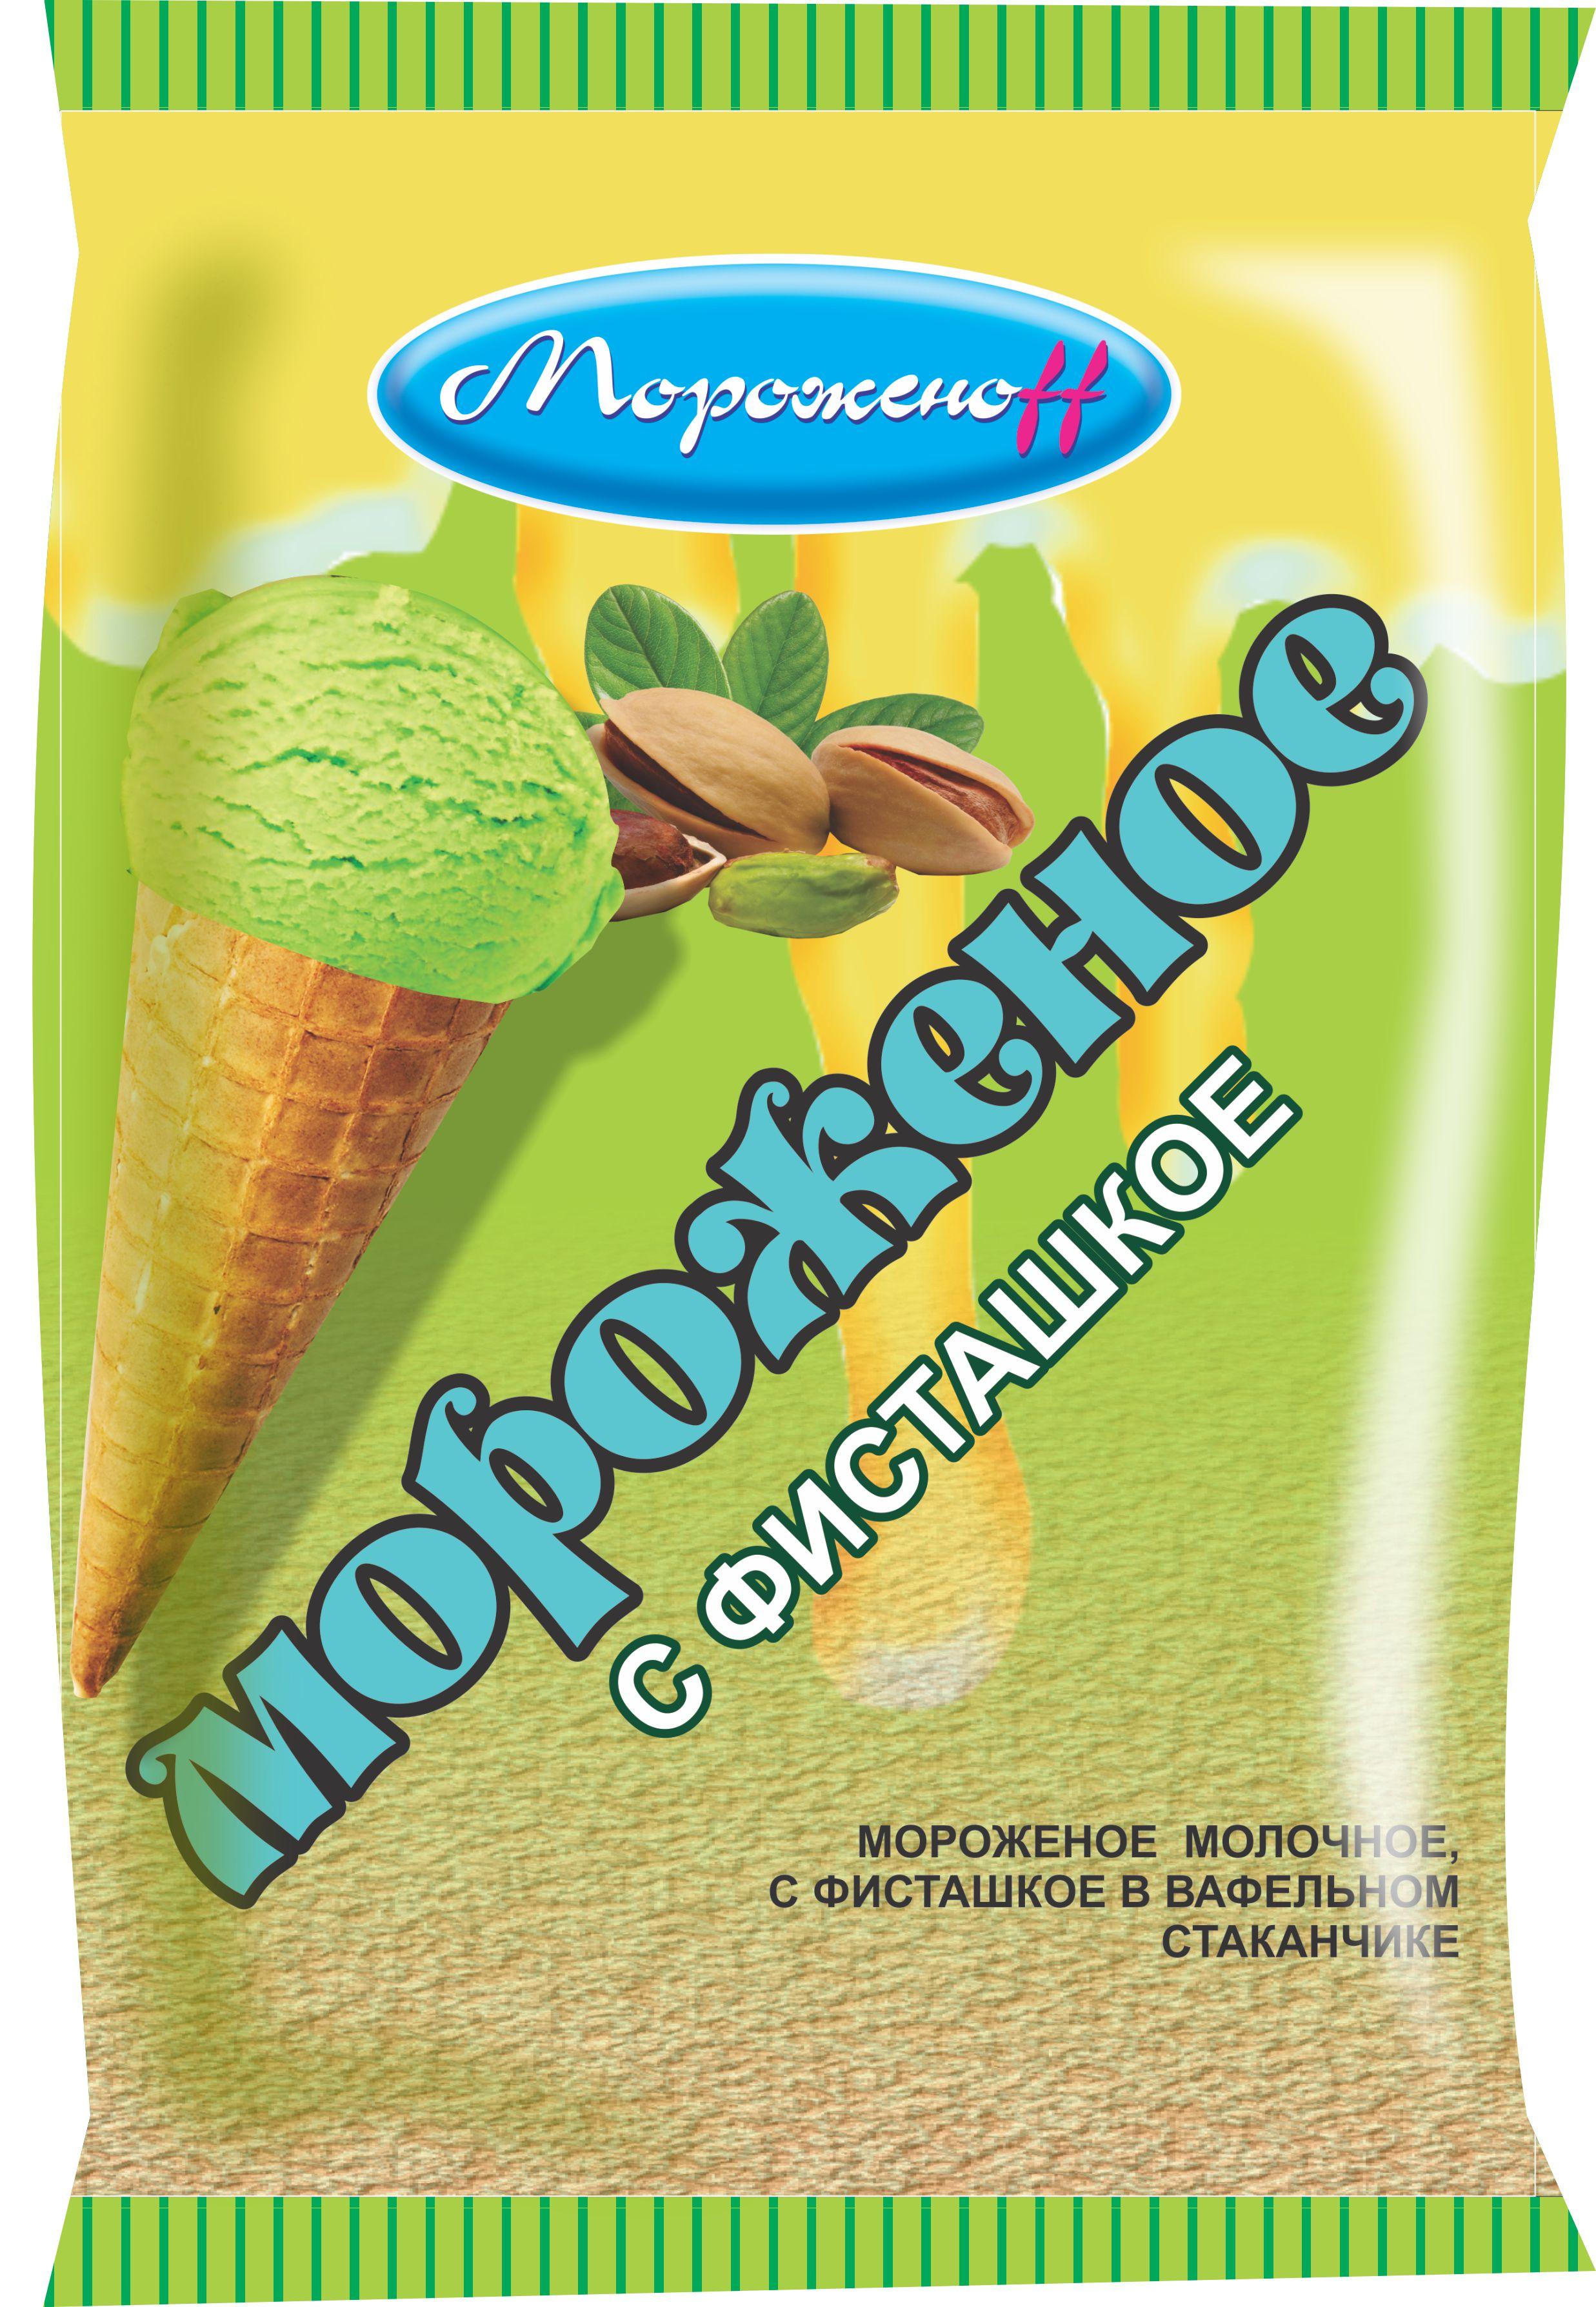 Разработка дизайна для упаковки мороженого фото f_638530b00c9f0eb4.jpg